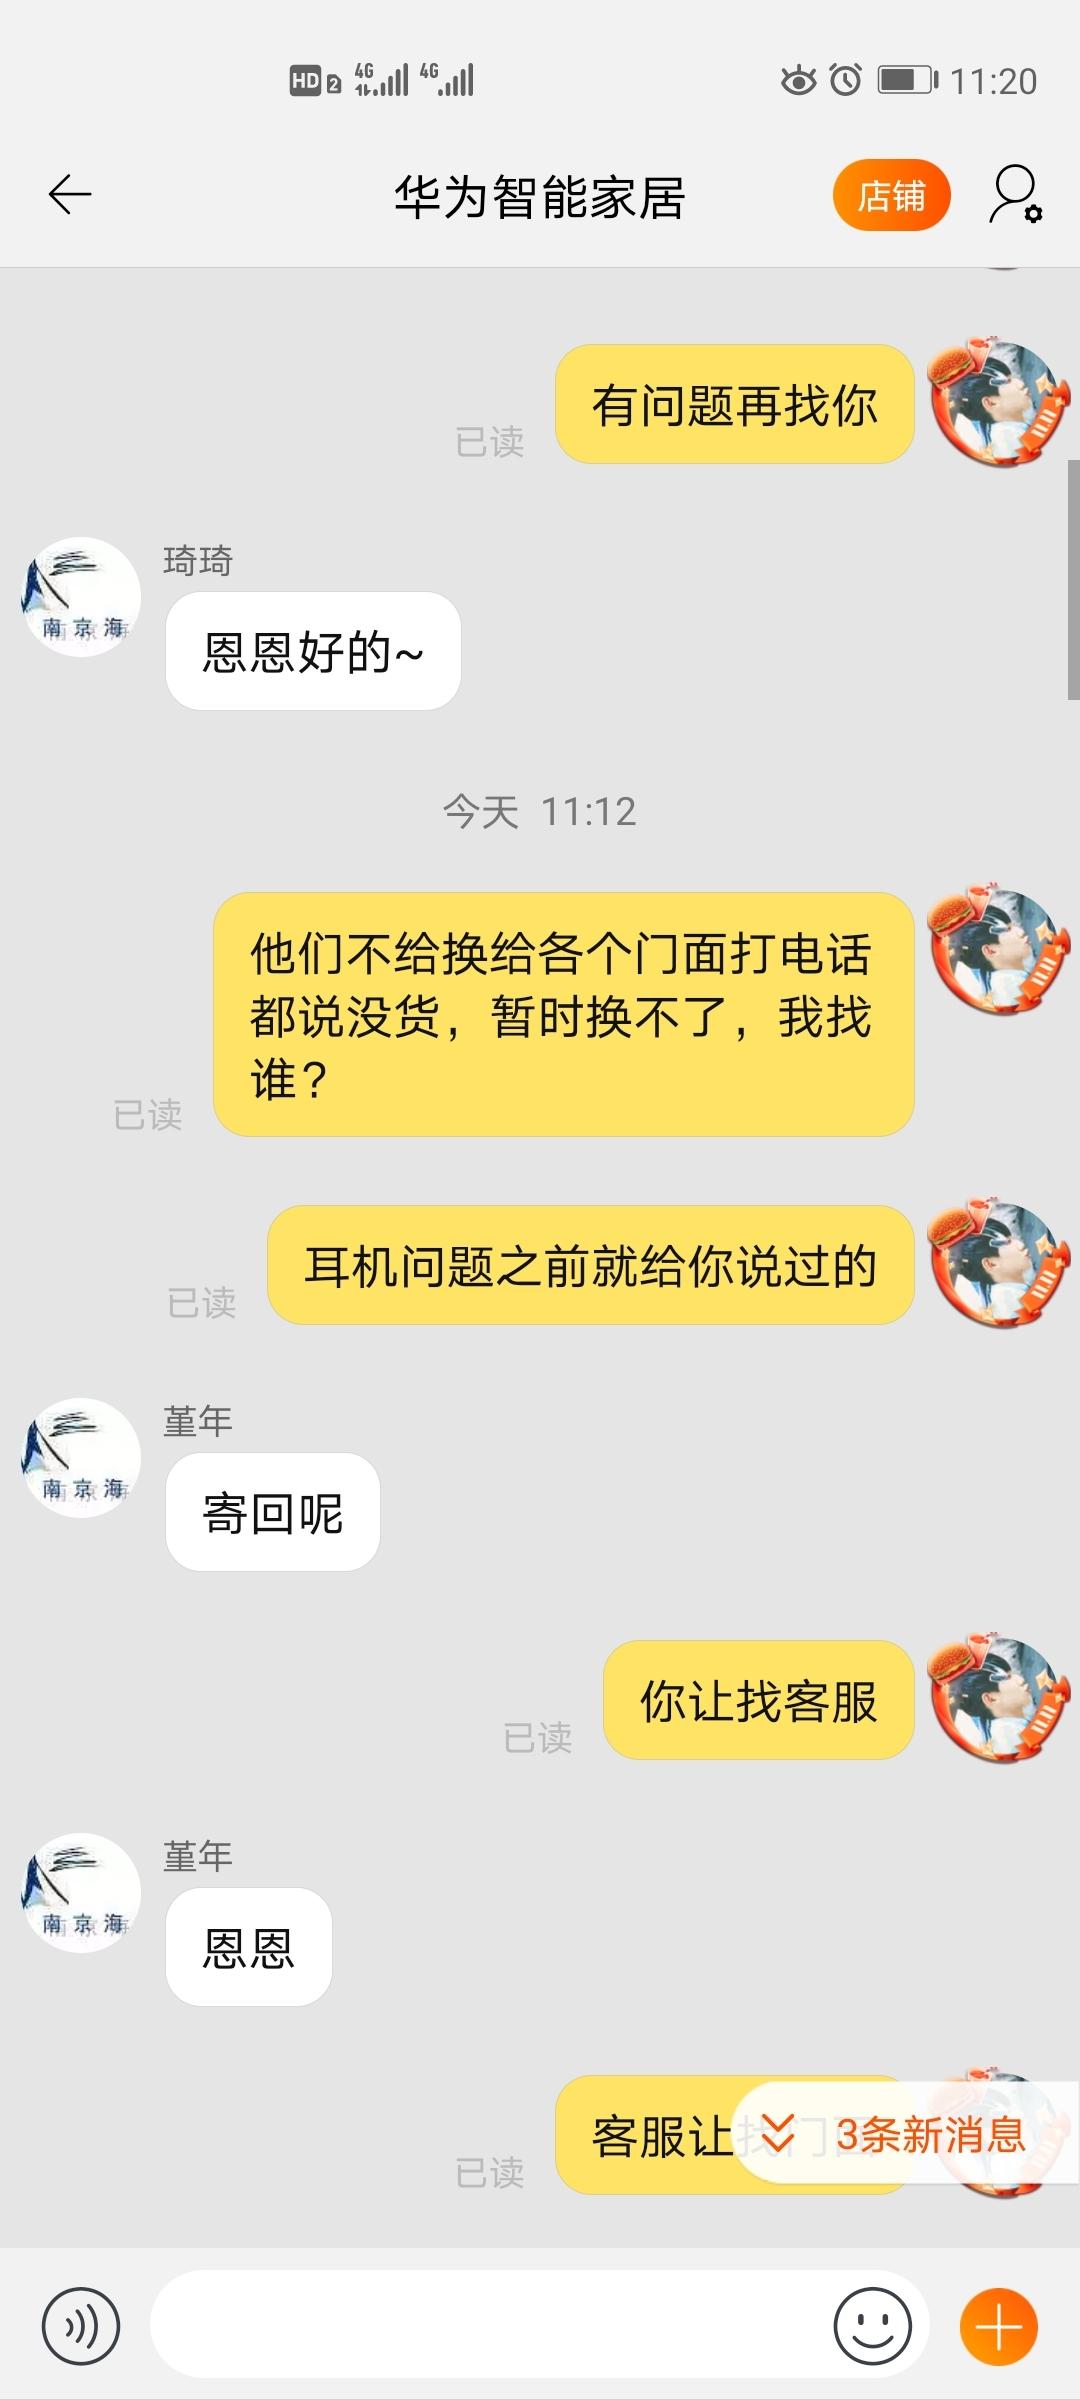 Screenshot_20200508_112049_com.taobao.taobao.jpg